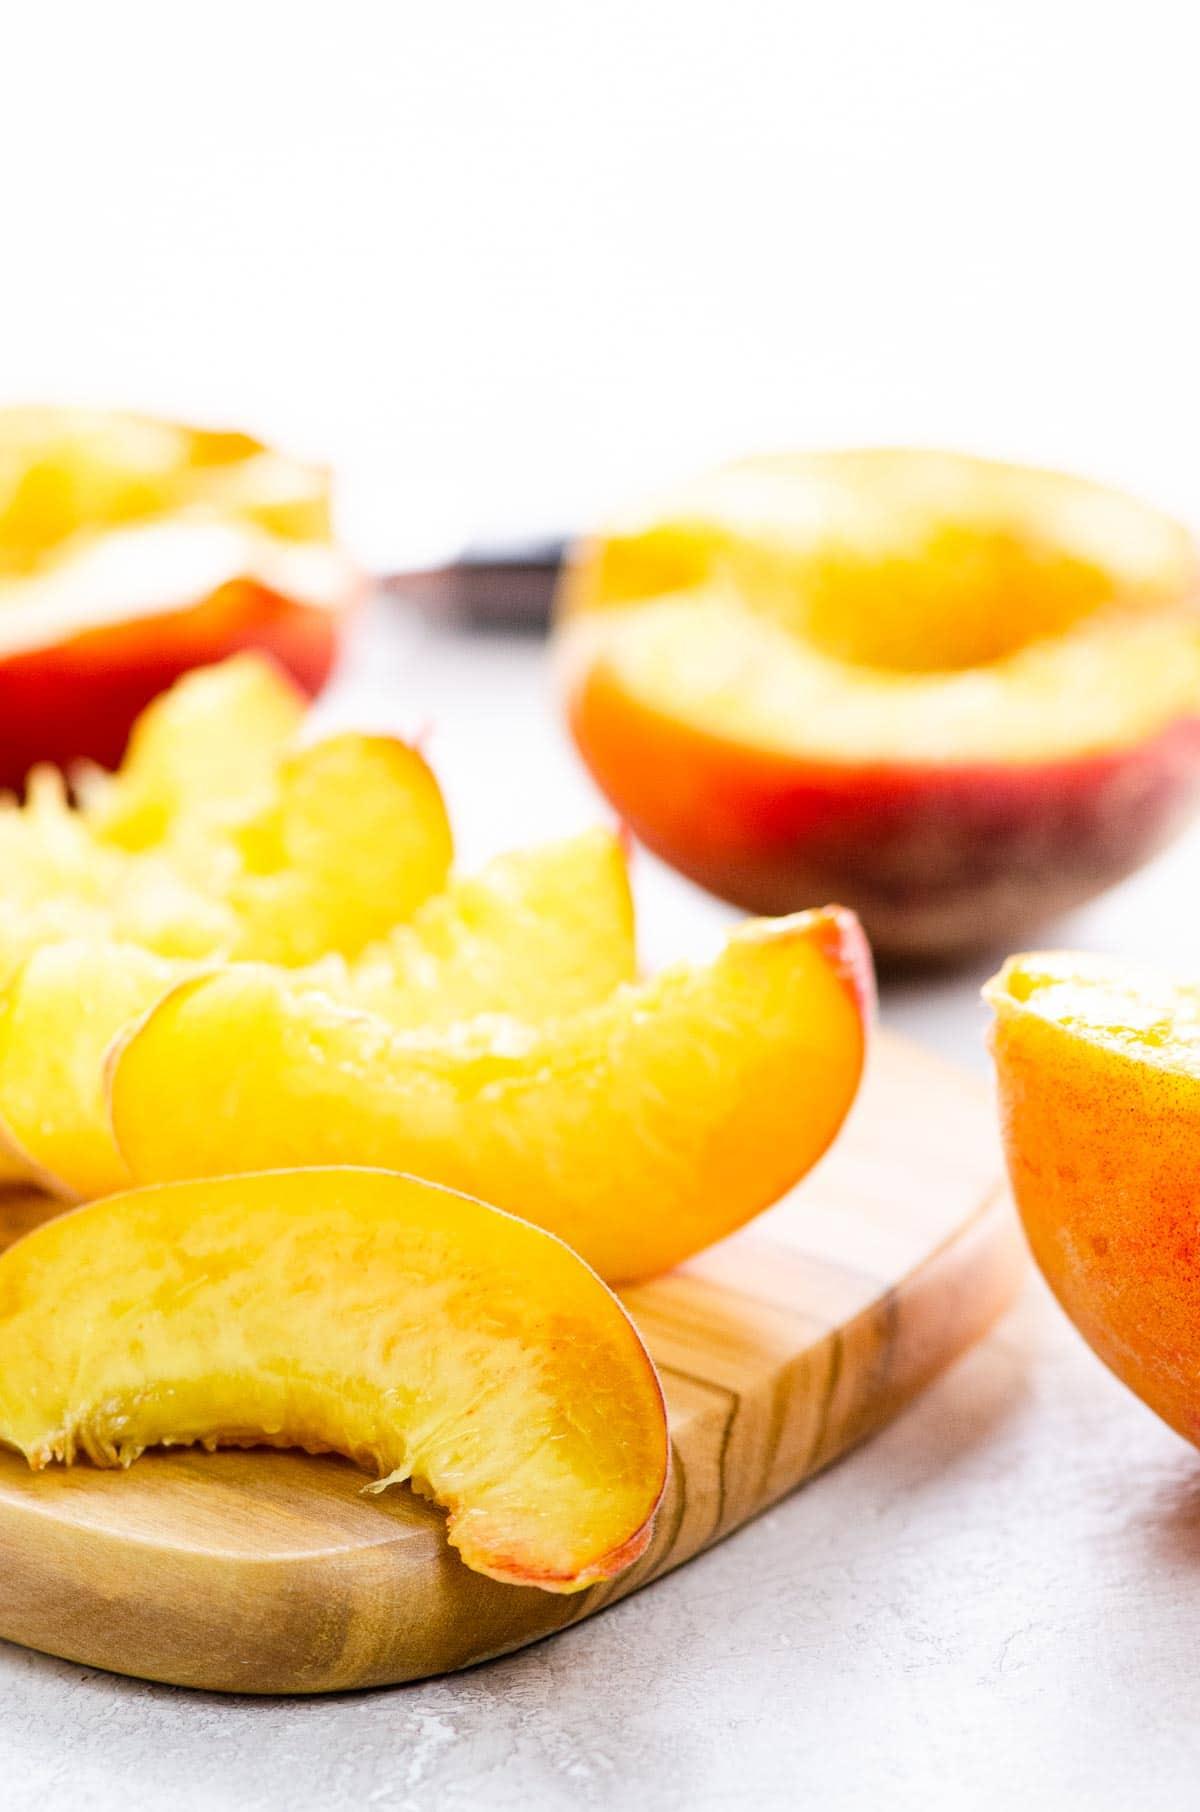 peach slices and halves